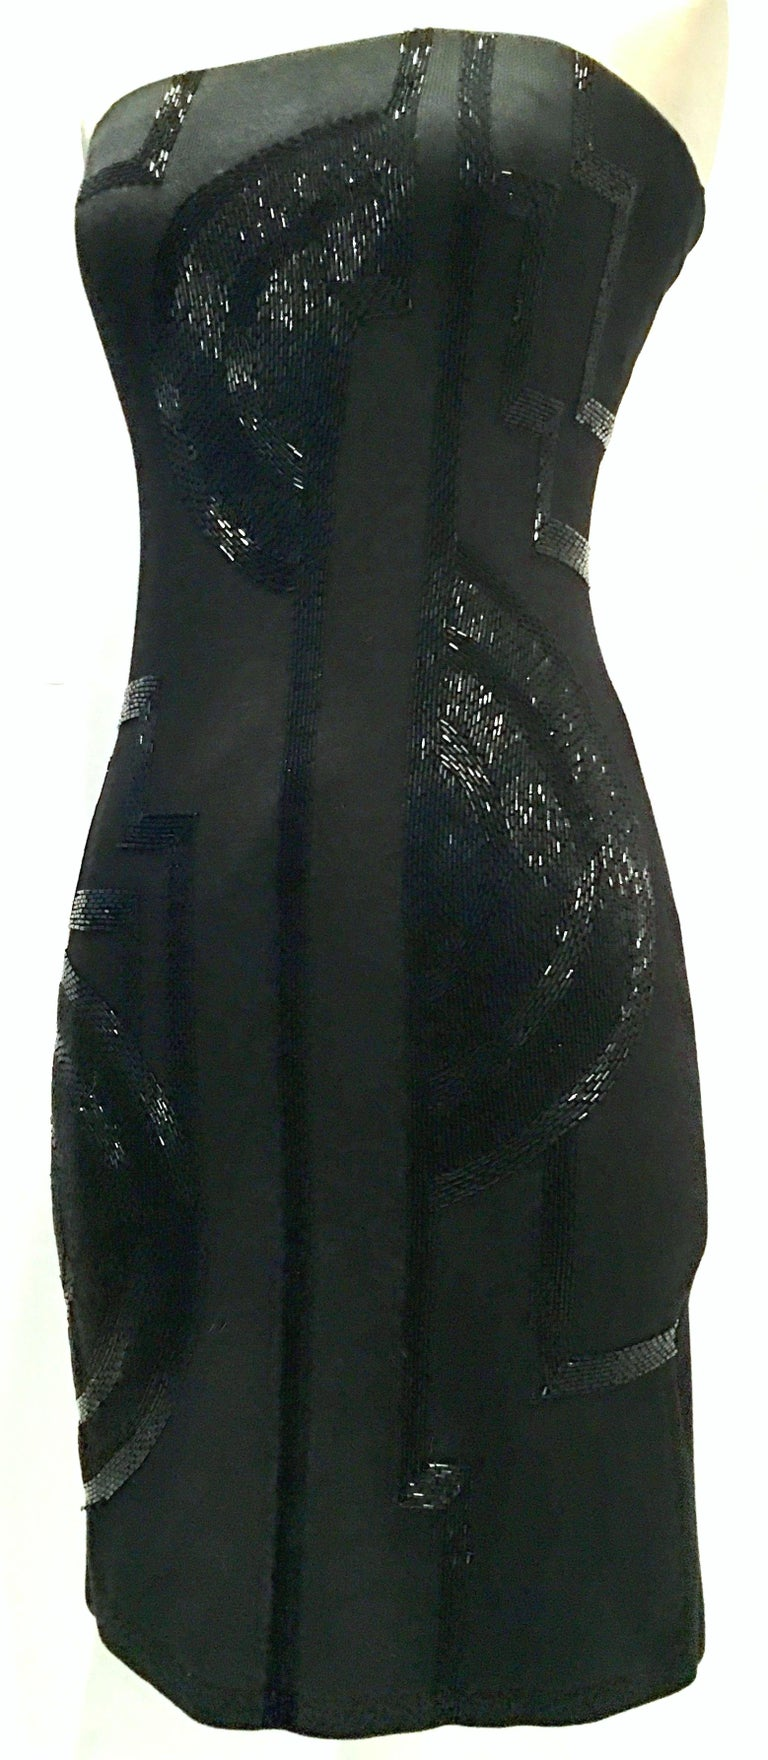 Black 21st Century & New Silk Knit Beaded Strapless Cocktail Dress By, Ralph Lauren